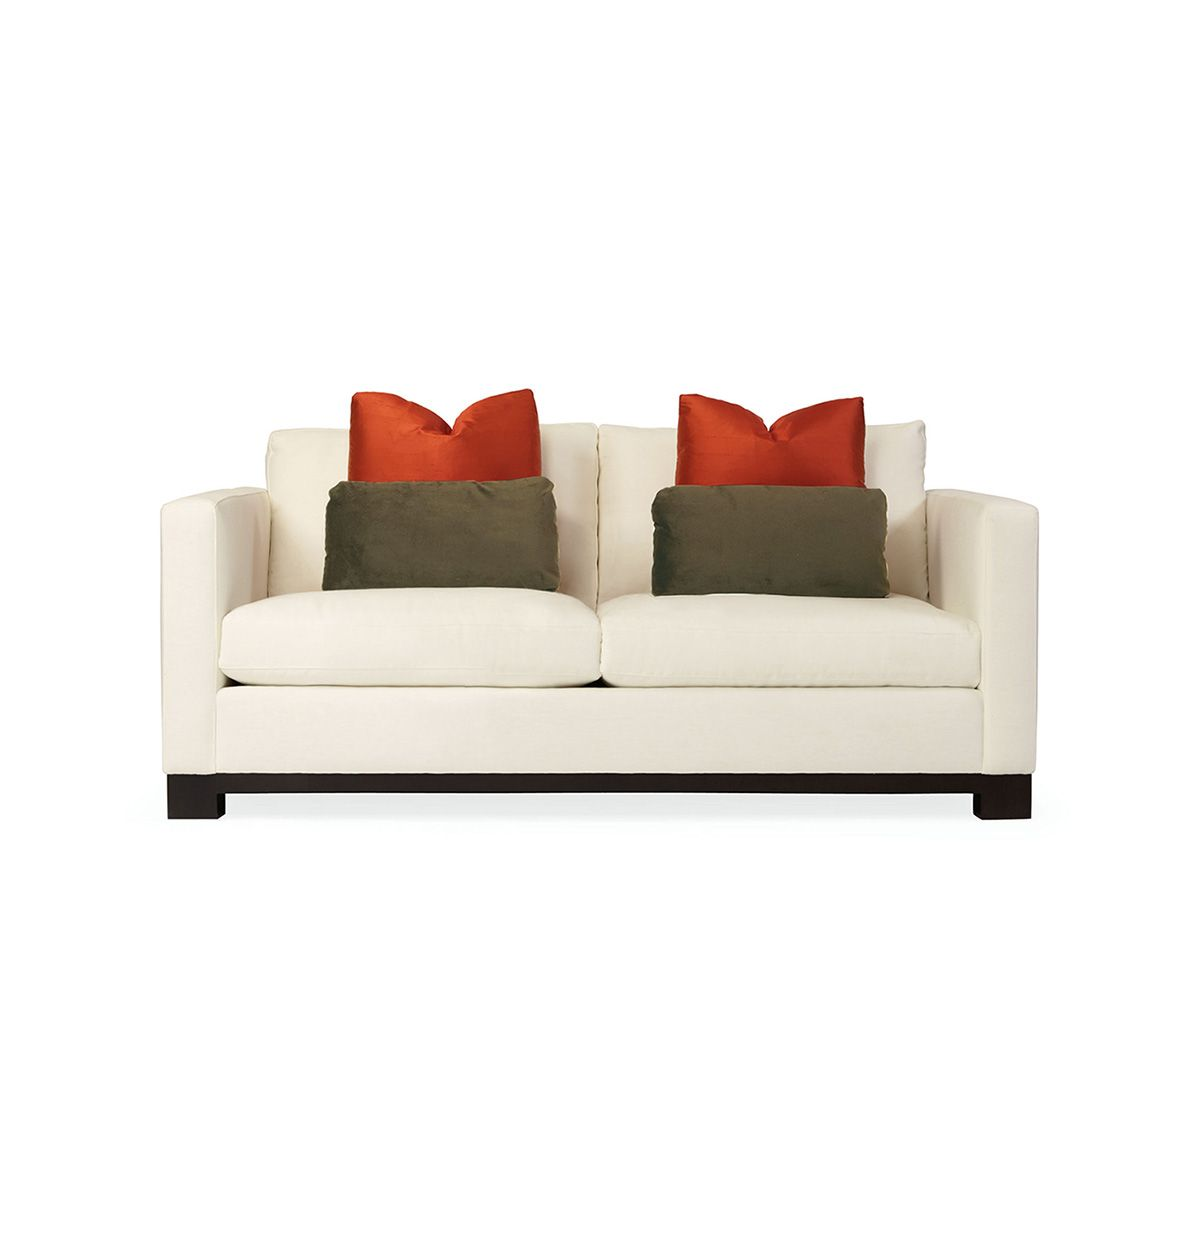 BERNHARDT LANAI SOFA amp SET Colliers Furniture Expo : N1655412000 from www.thefurnitureexpo.com size 1200 x 1235 jpeg 37kB